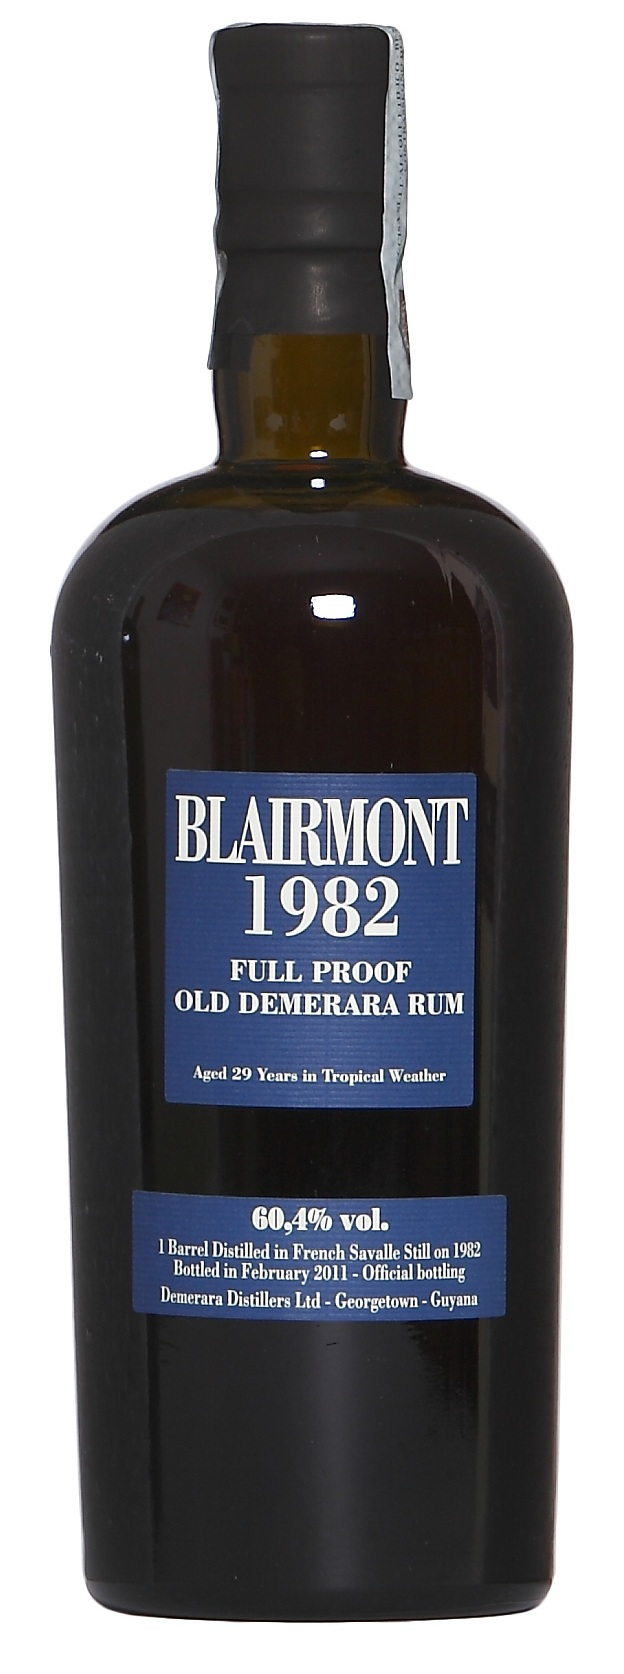 Blairmont 1982 crop